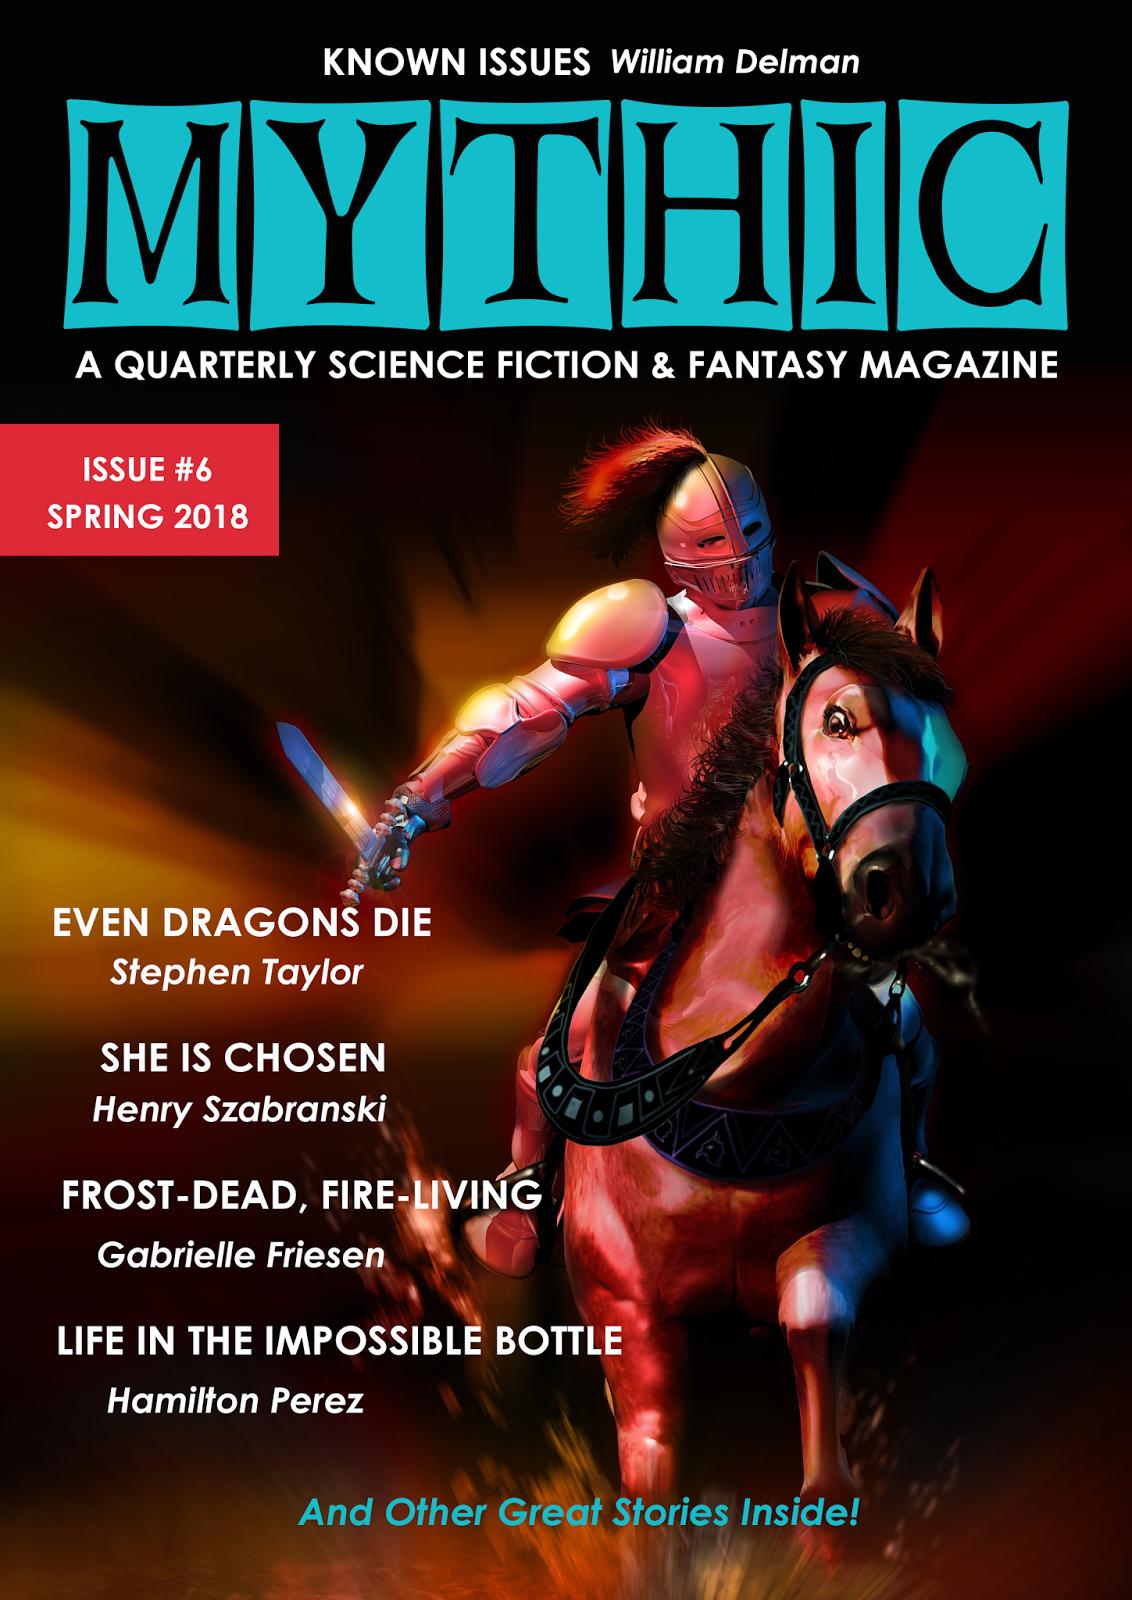 Mythic Magazine